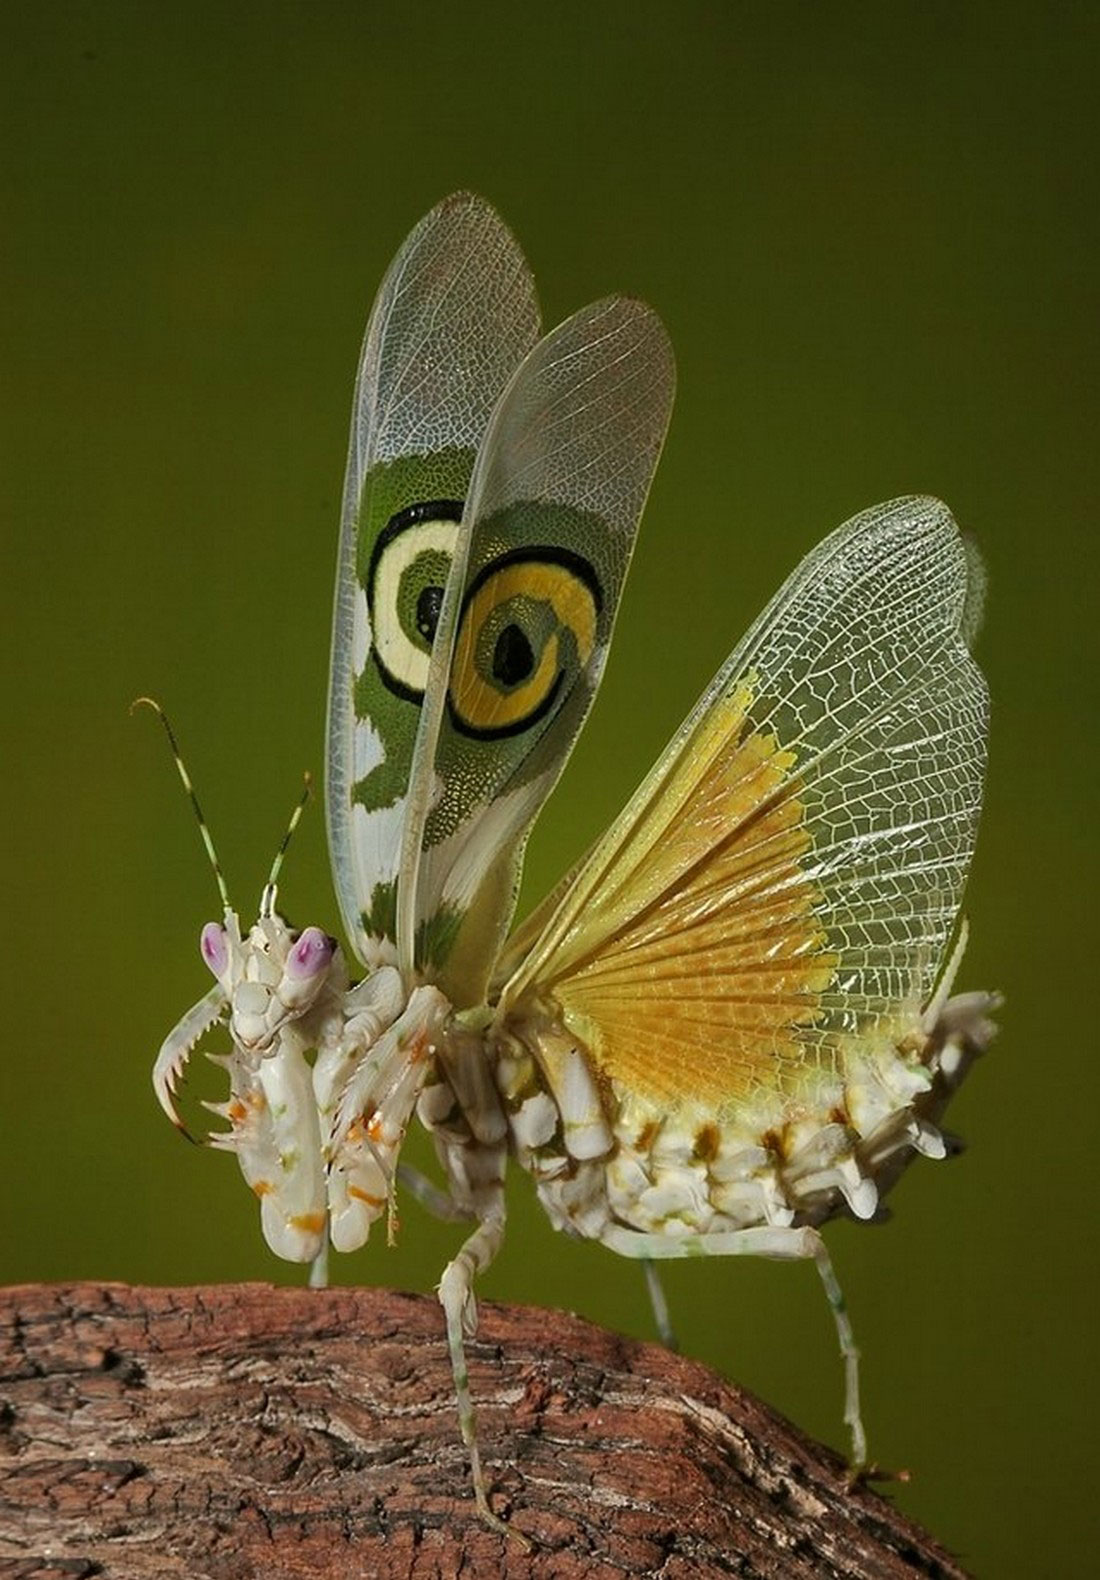 богомол с крыльями, фото